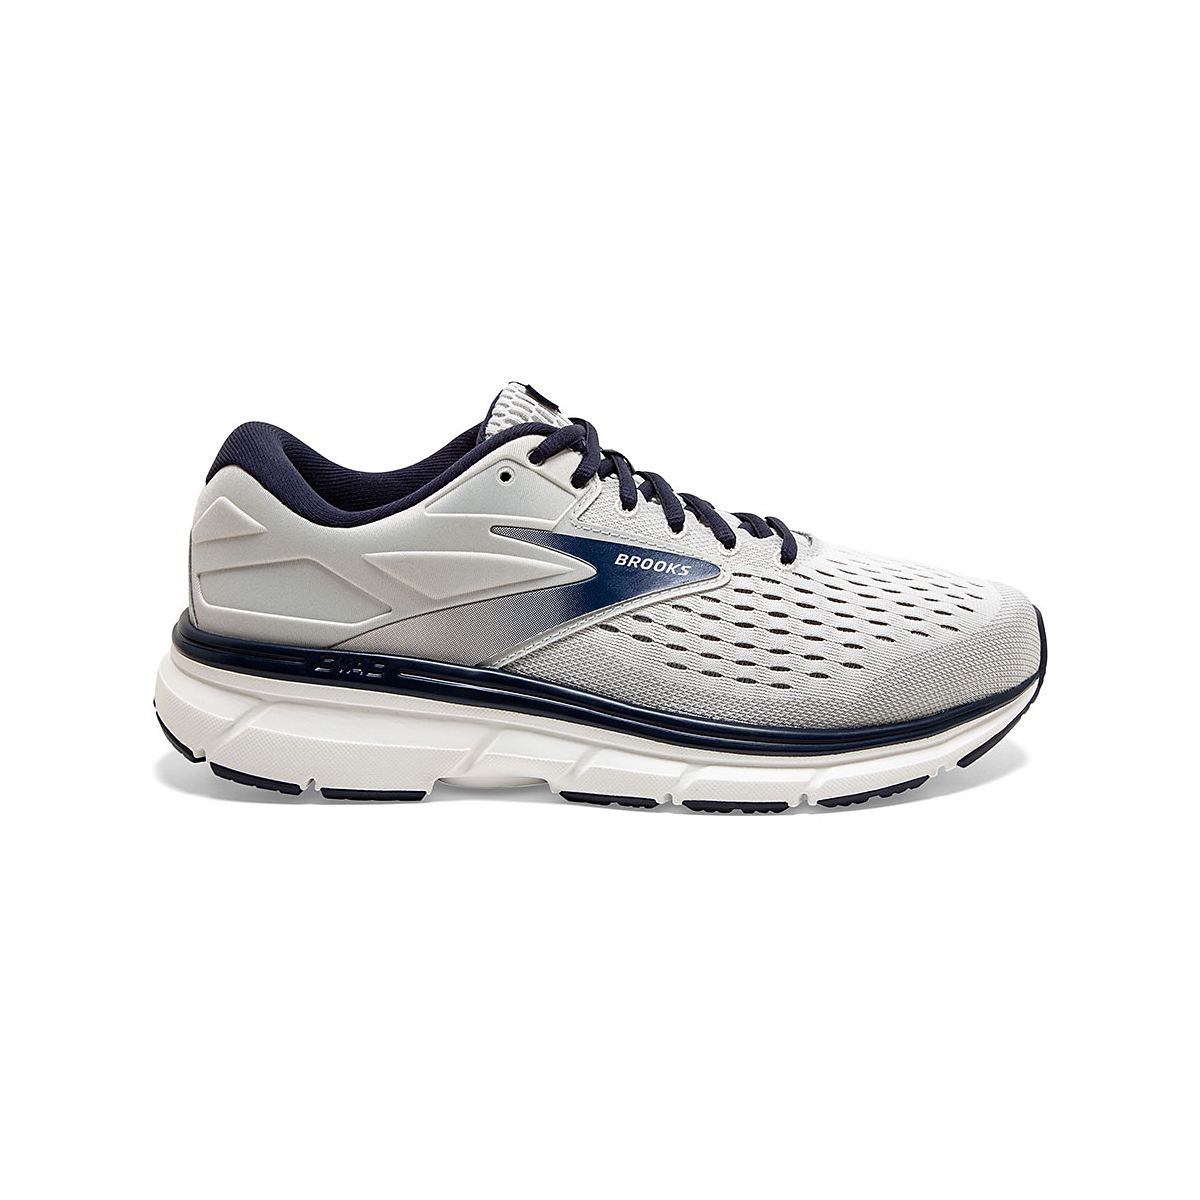 Men's Brooks Dyad 11 Running Shoe - Color: Antarctica/Grey/Peacoat (Regular Width) - Size: 7, Antarctica/Grey/Peacoat, large, image 1